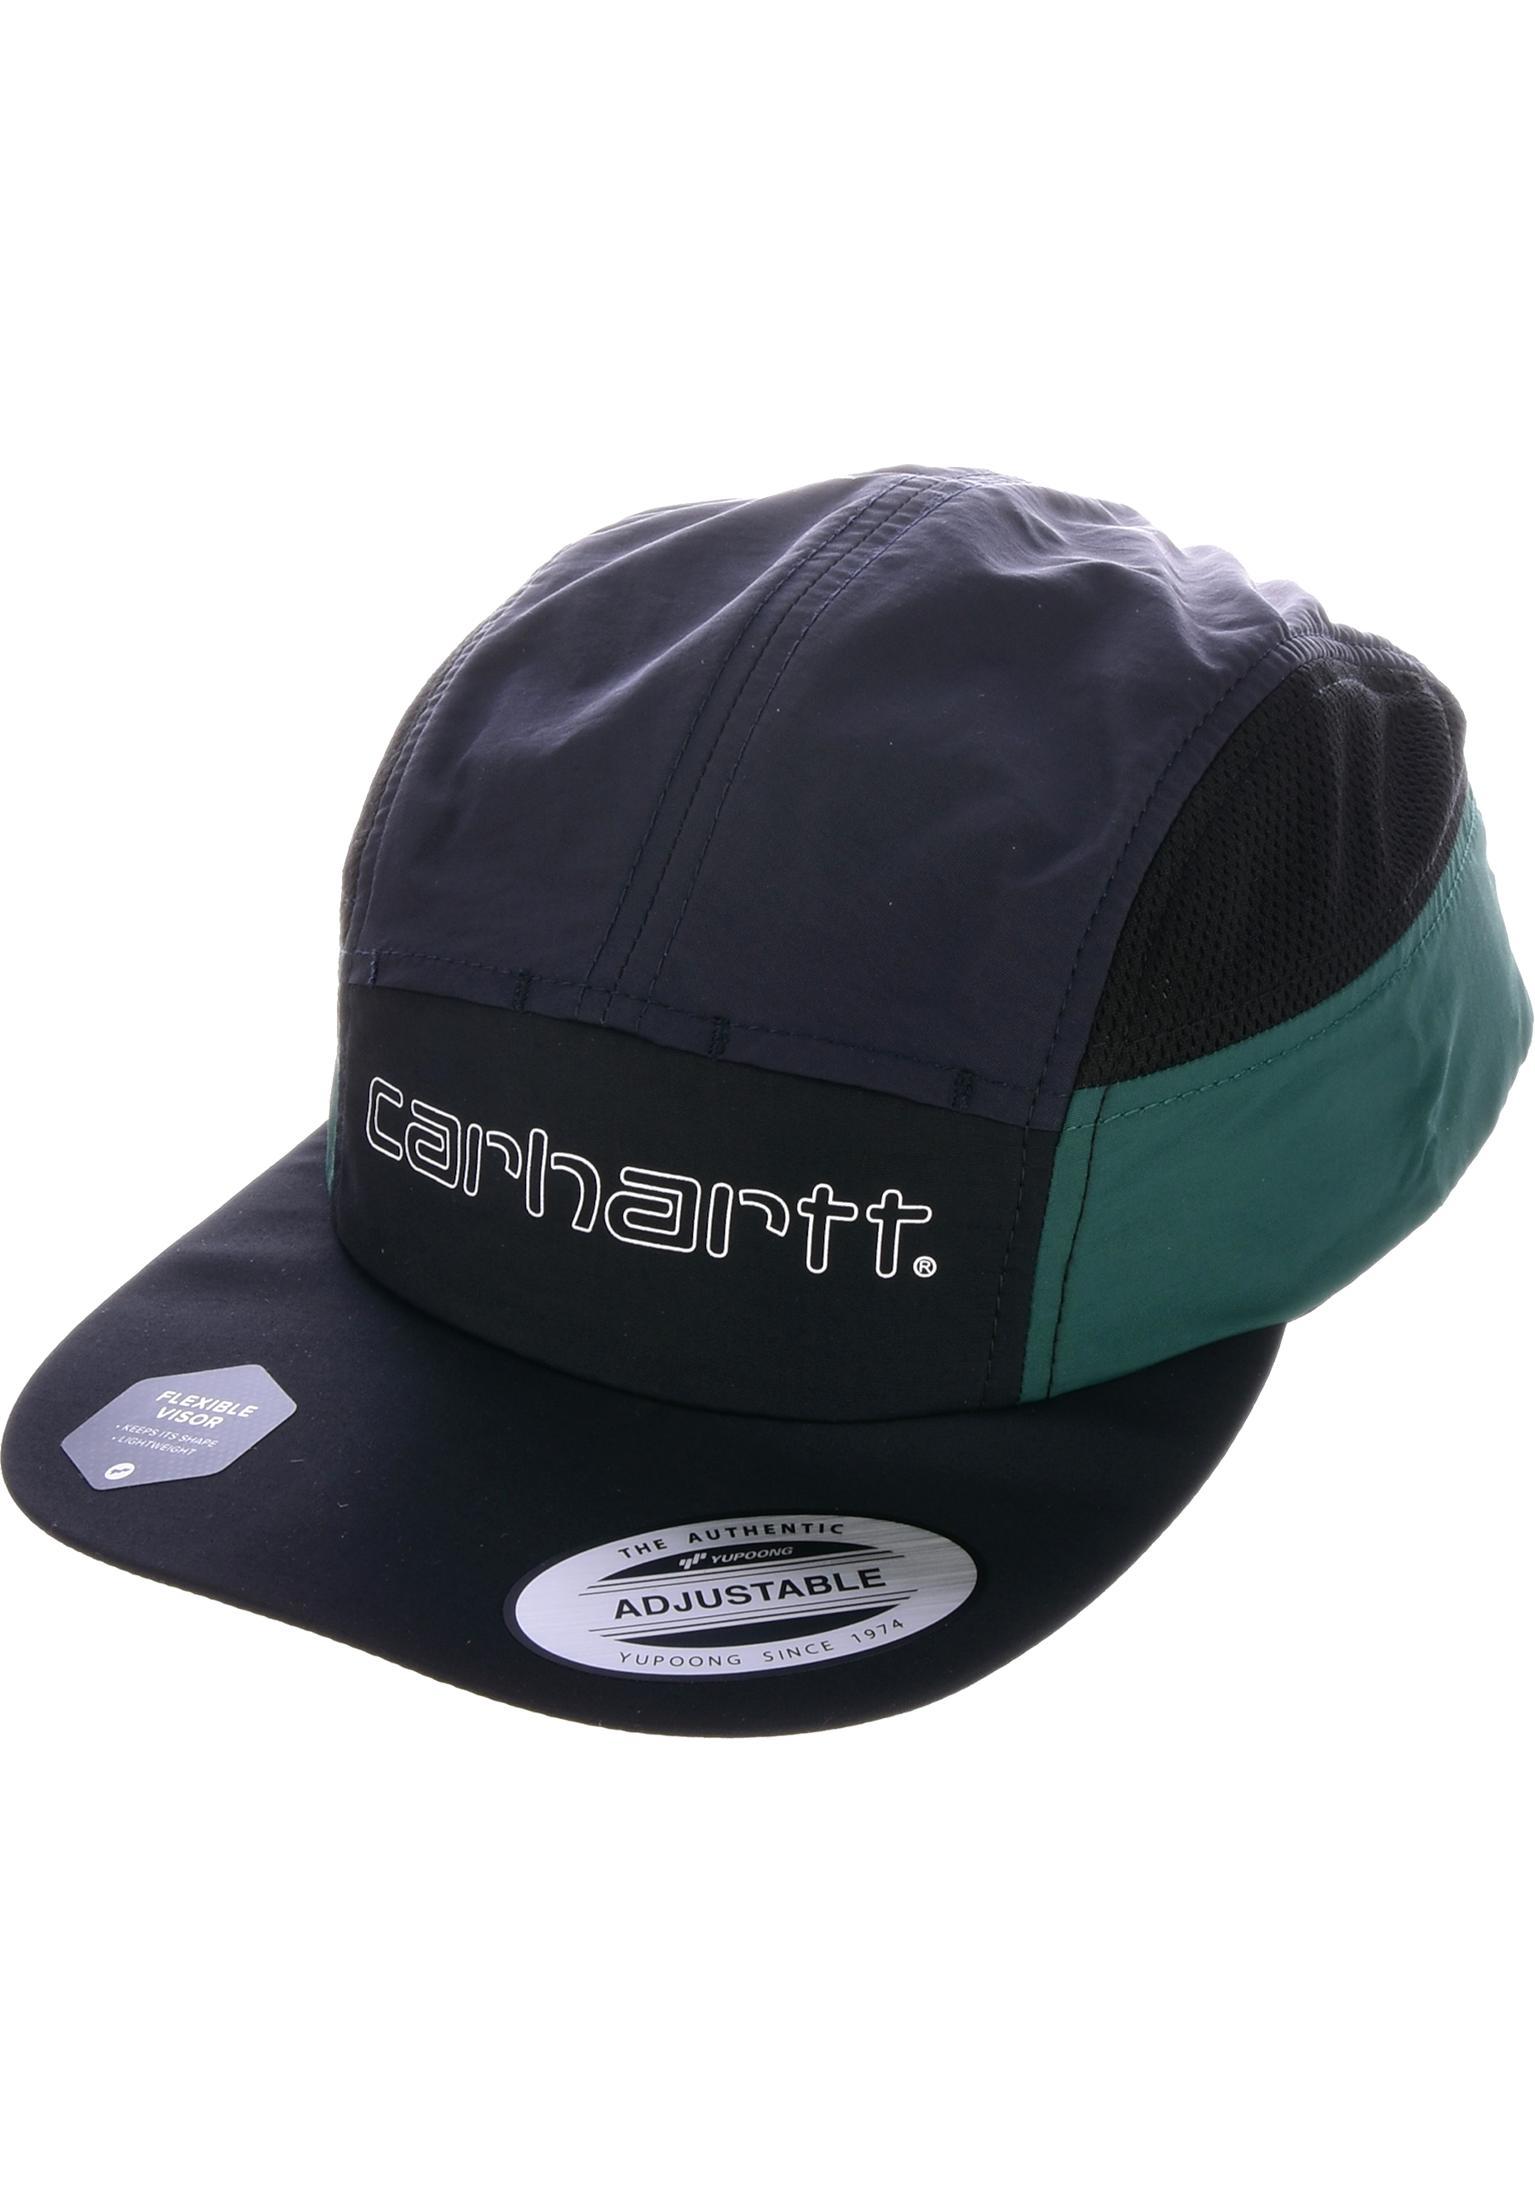 a17edbf843f65 Terrace Carhartt WIP Caps in black-darknavy-bottlegreen-black for Men